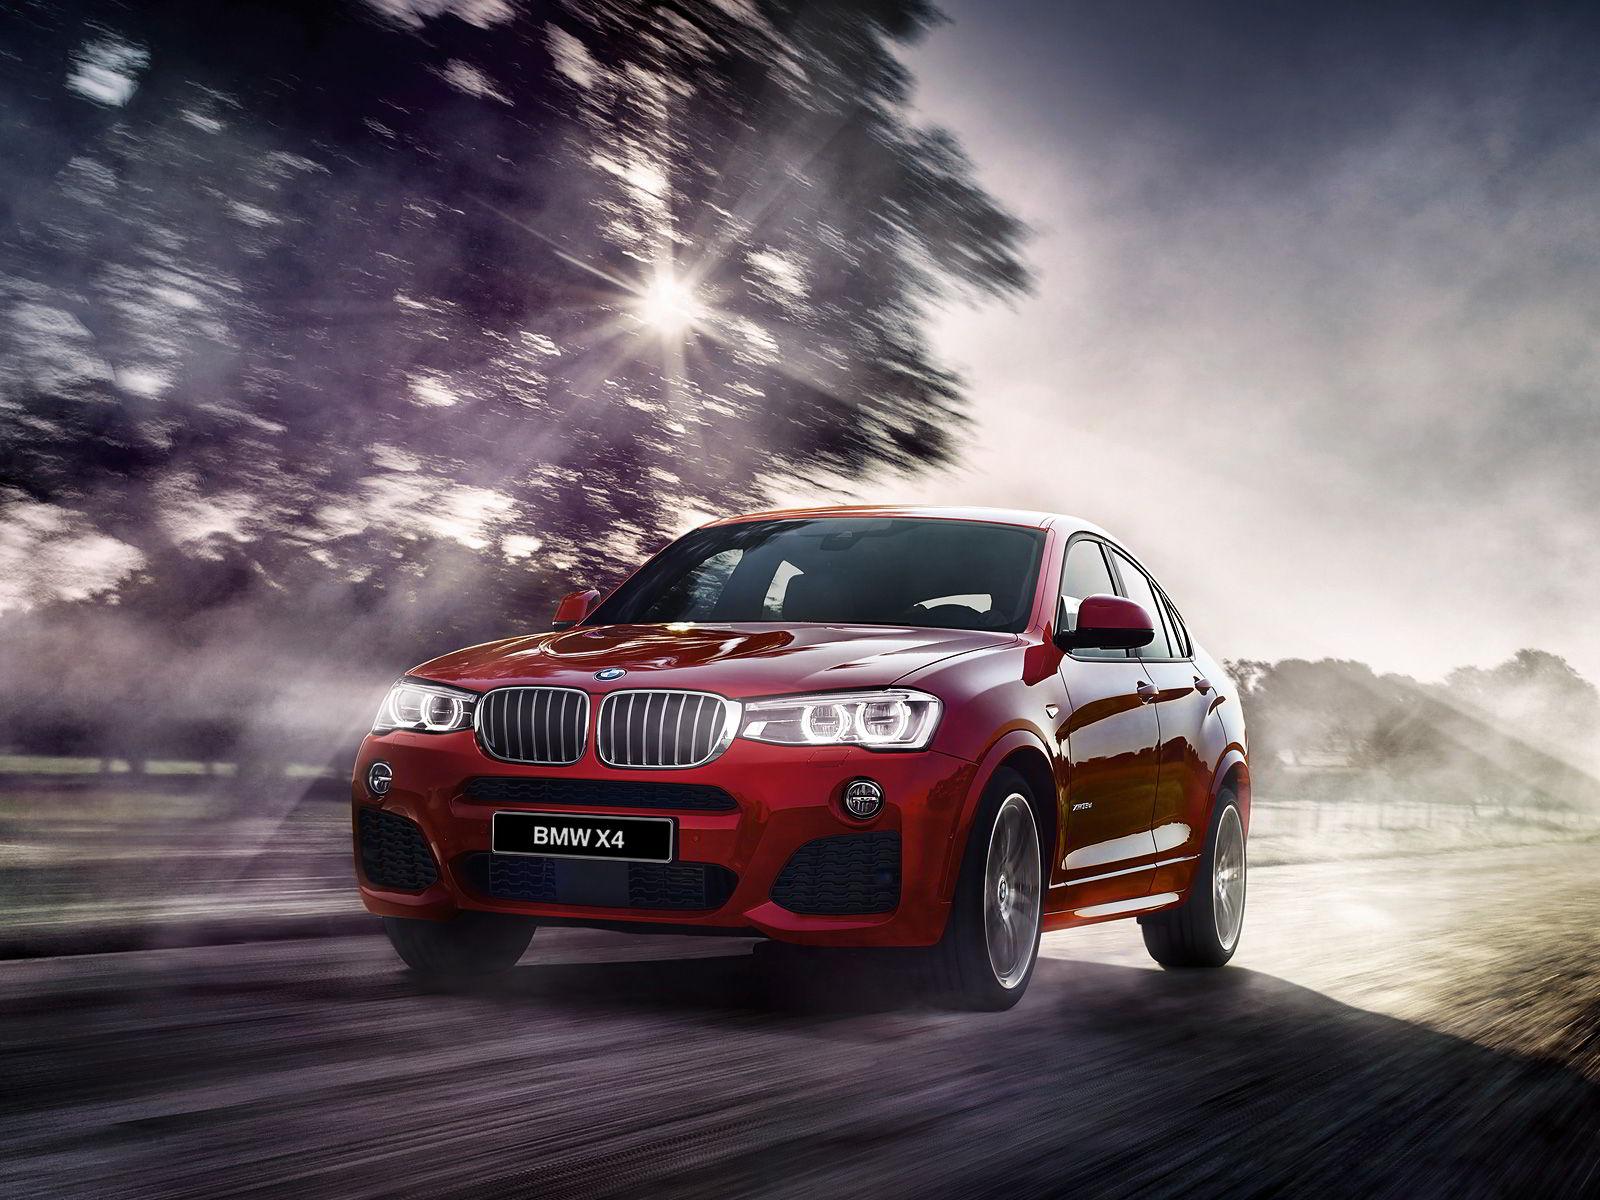 BMW X4 Россия